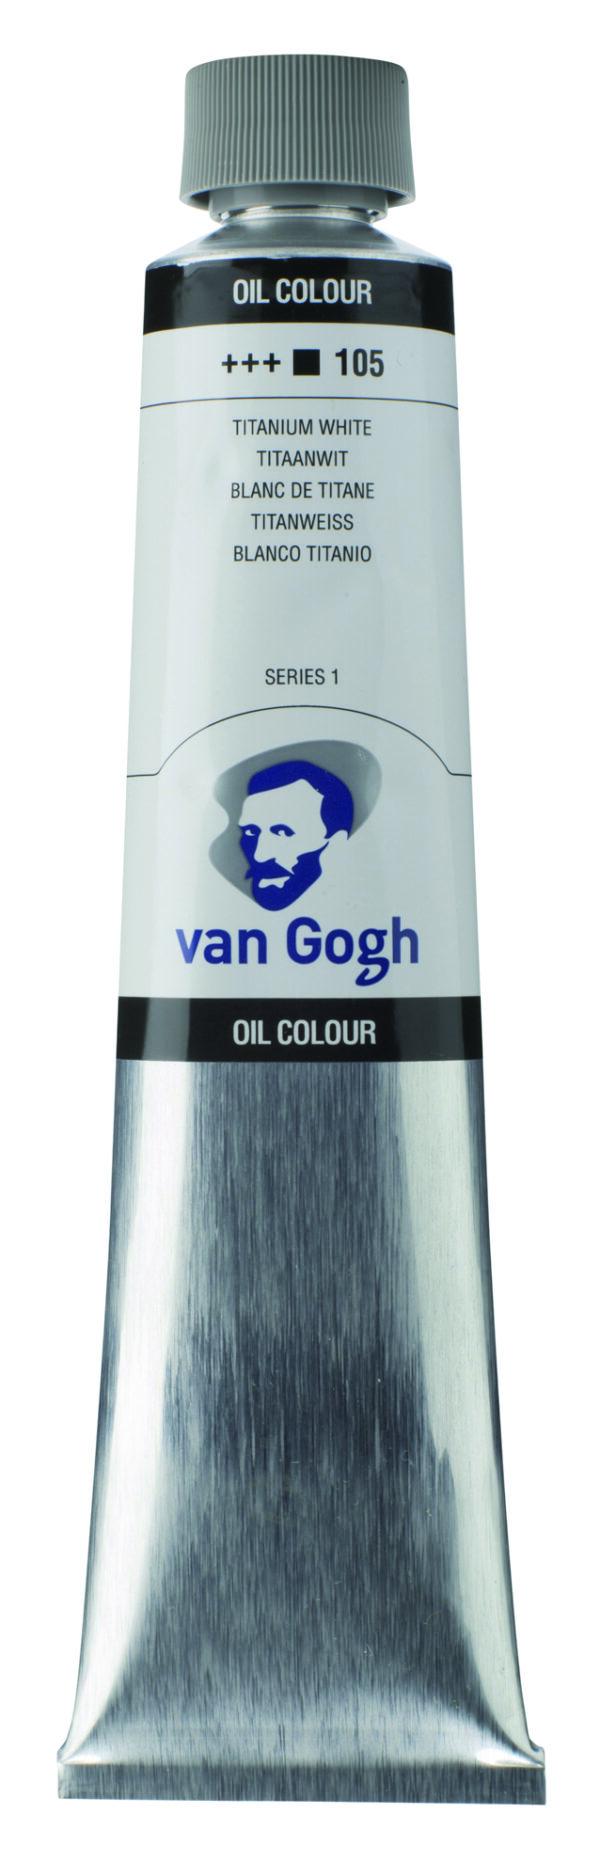 Van Gogh 105 Titanium white (safflor oil) - 200 ml